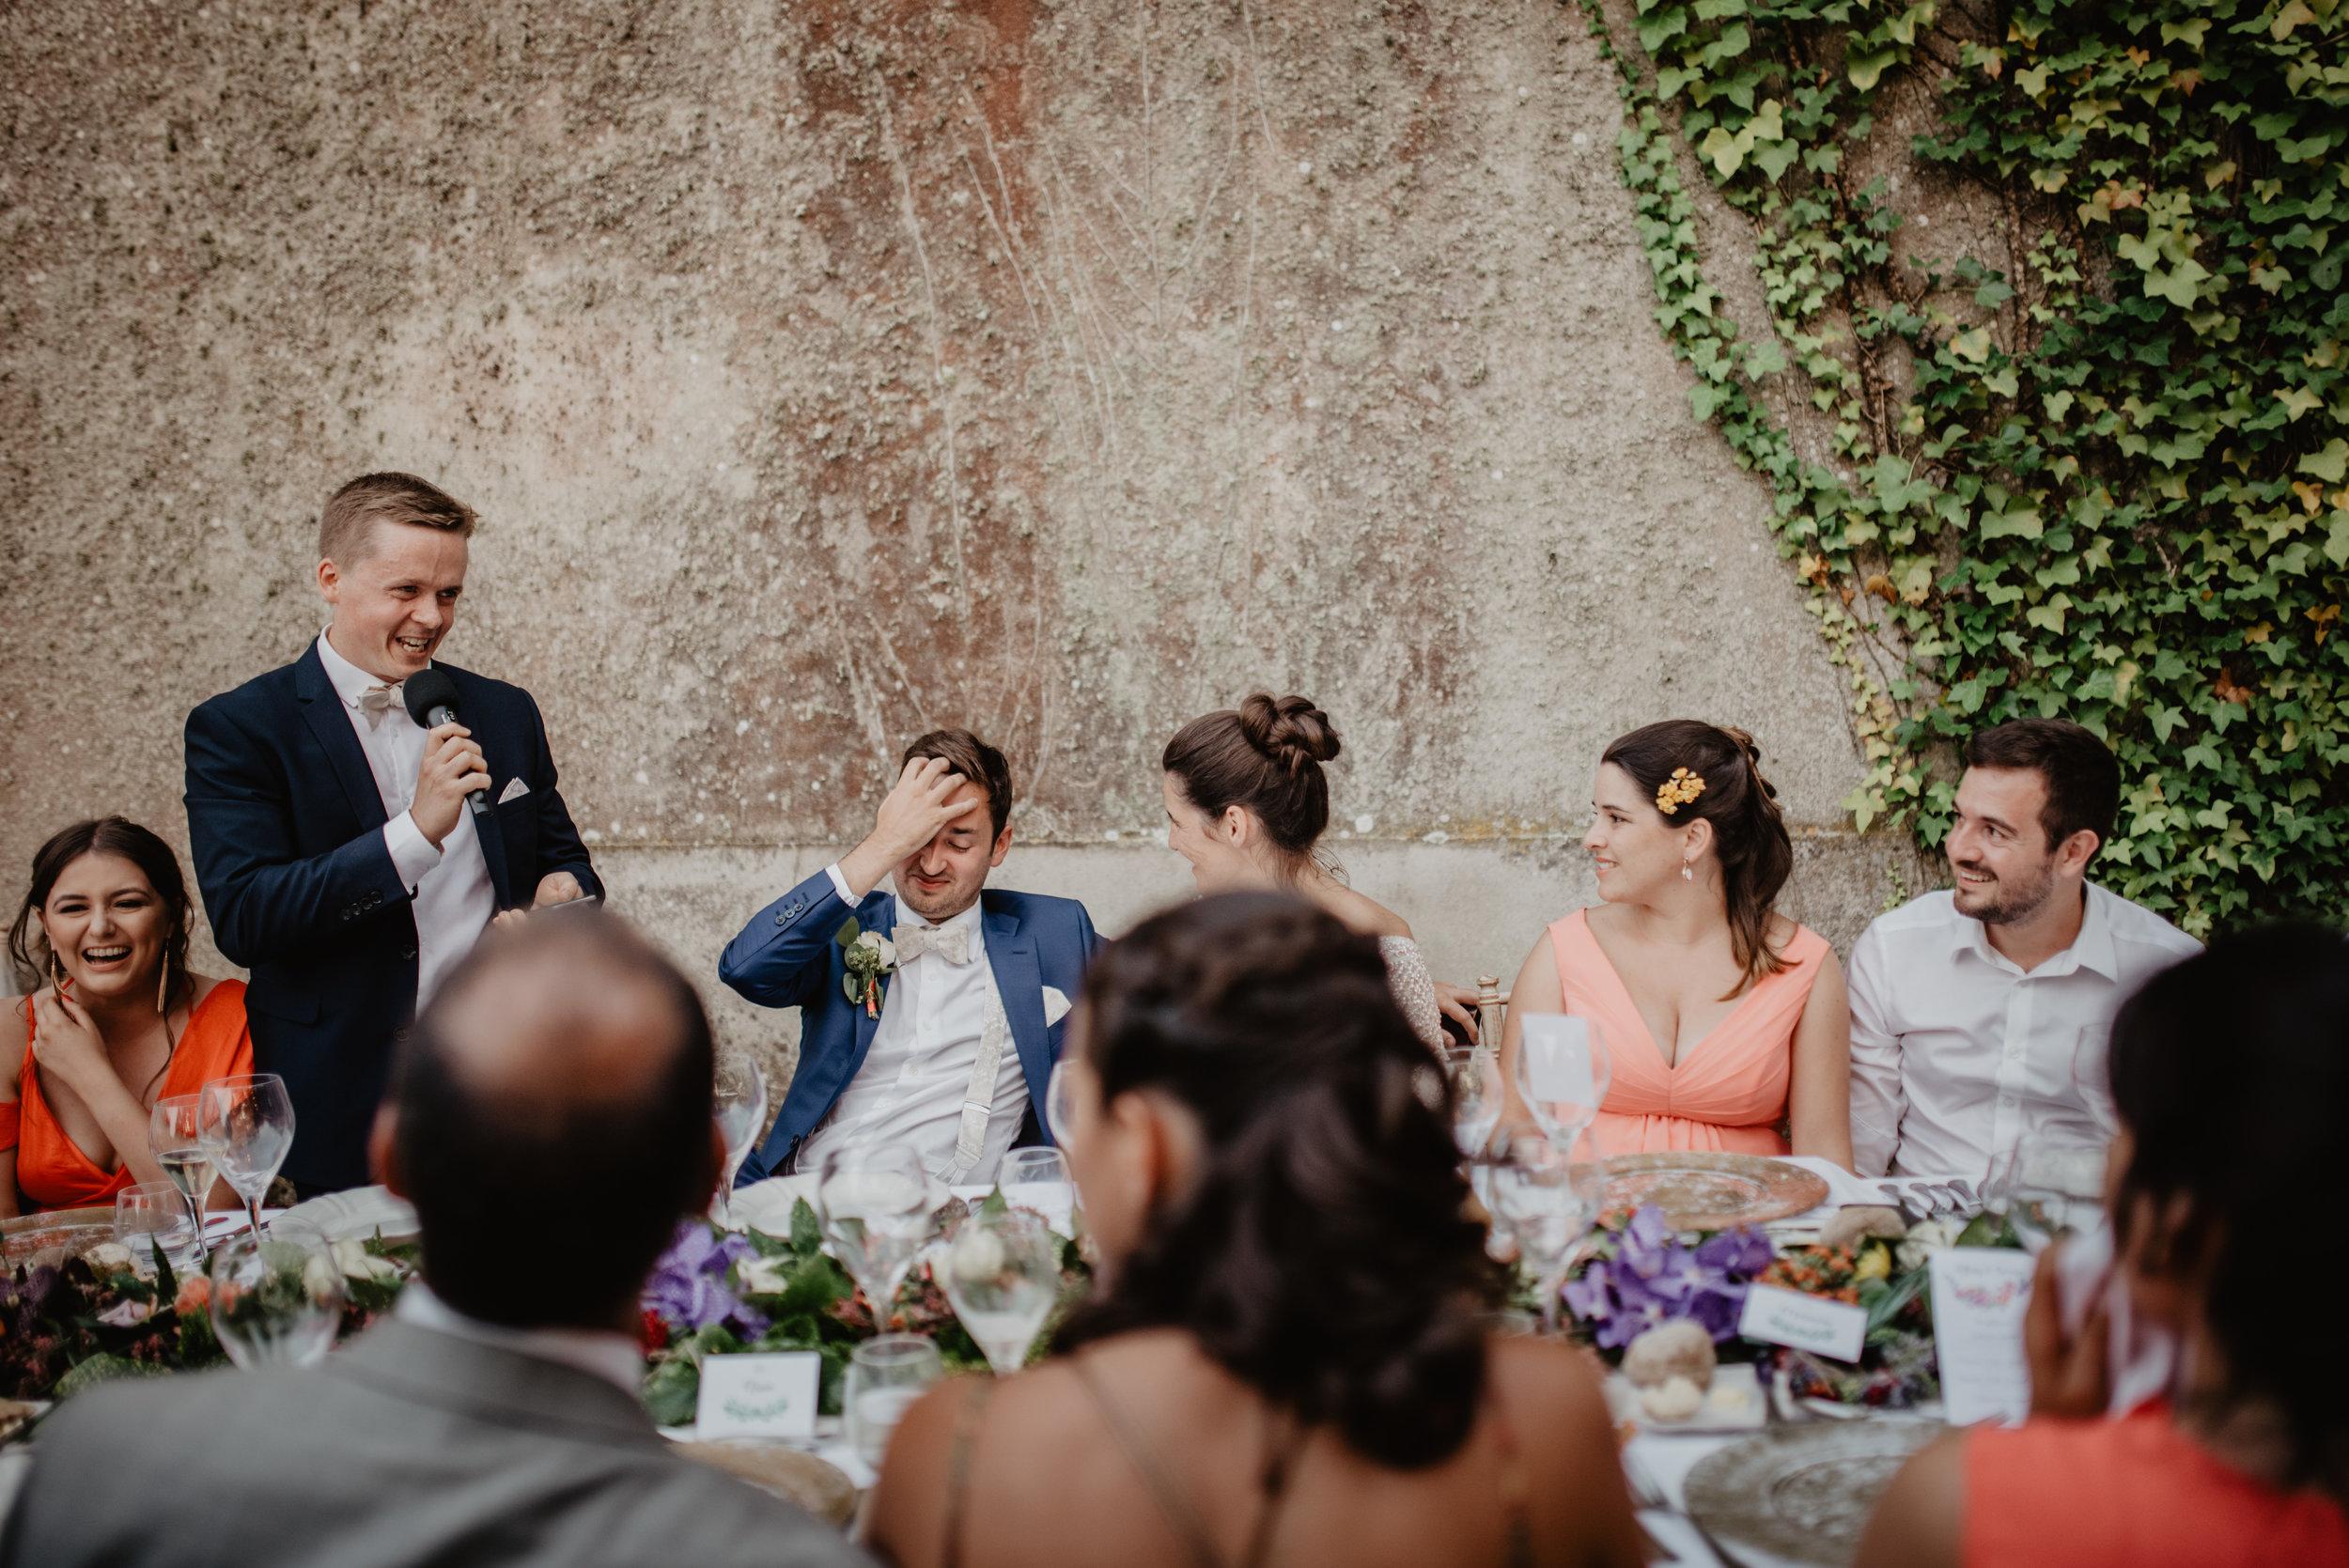 Lapela-photography-wedding-sintra-portugal-118.jpg